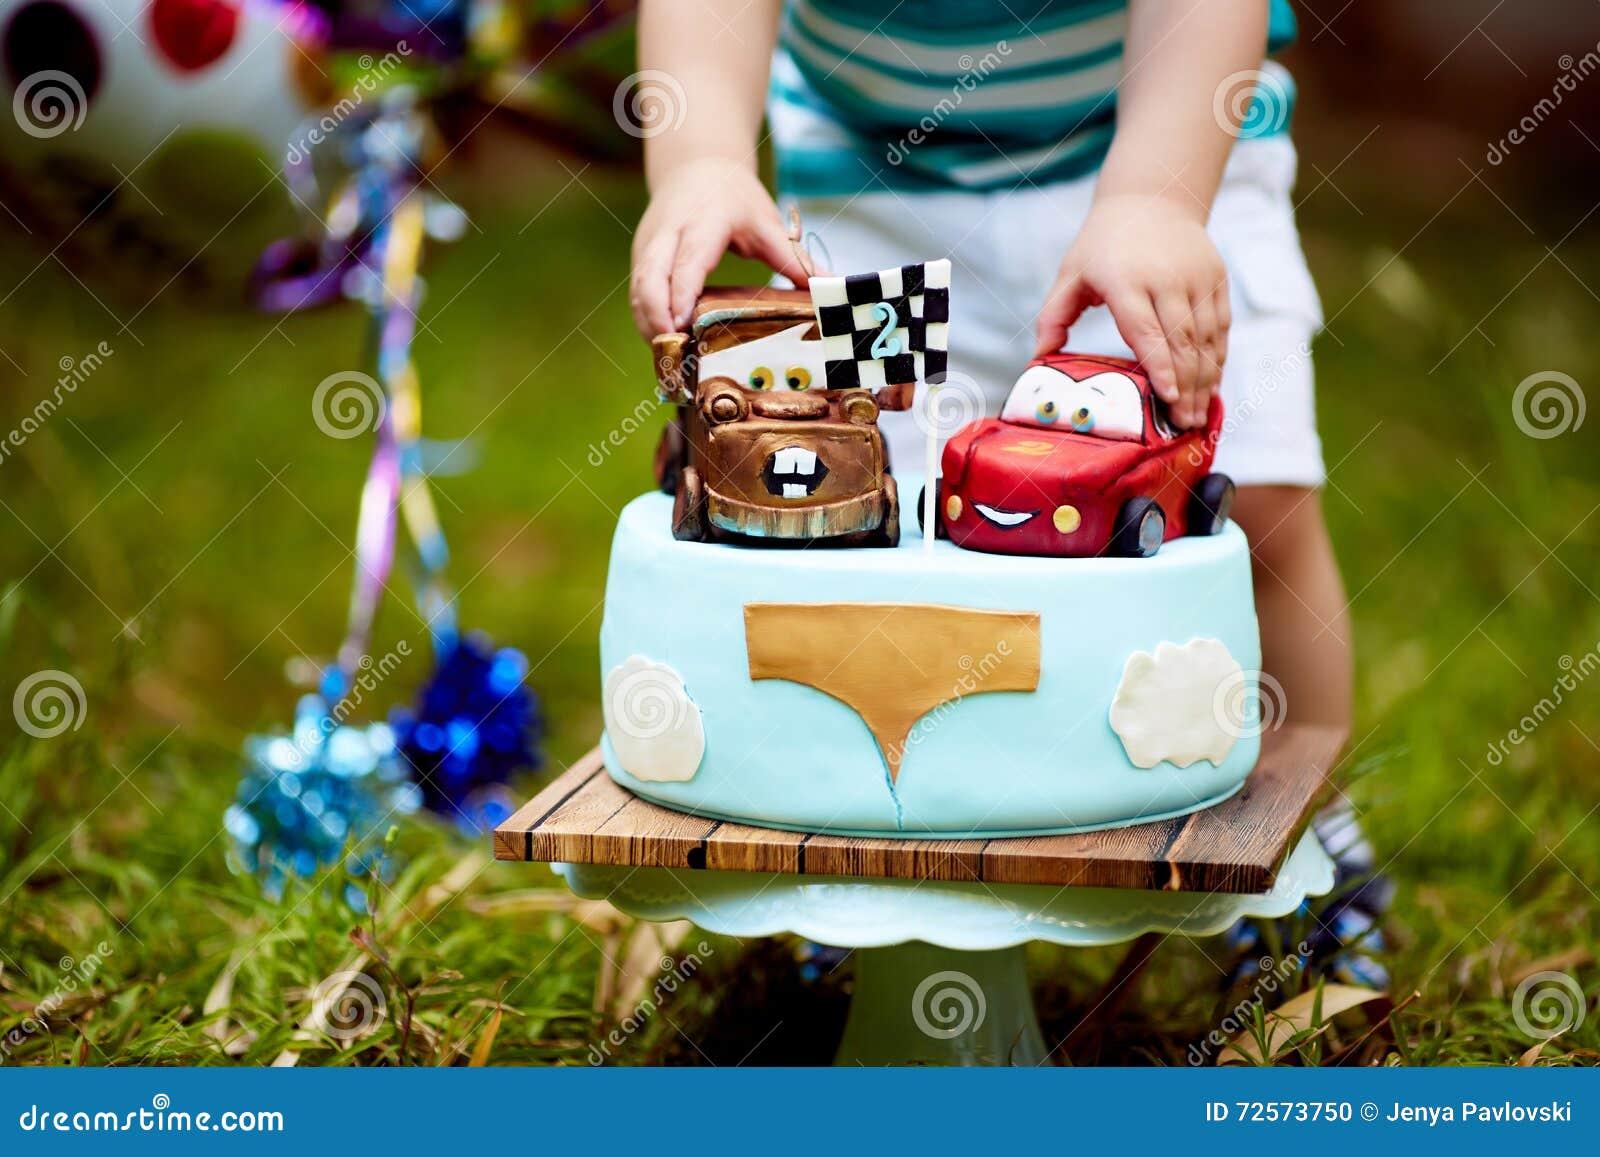 Lightning Mcqueen baby cakes